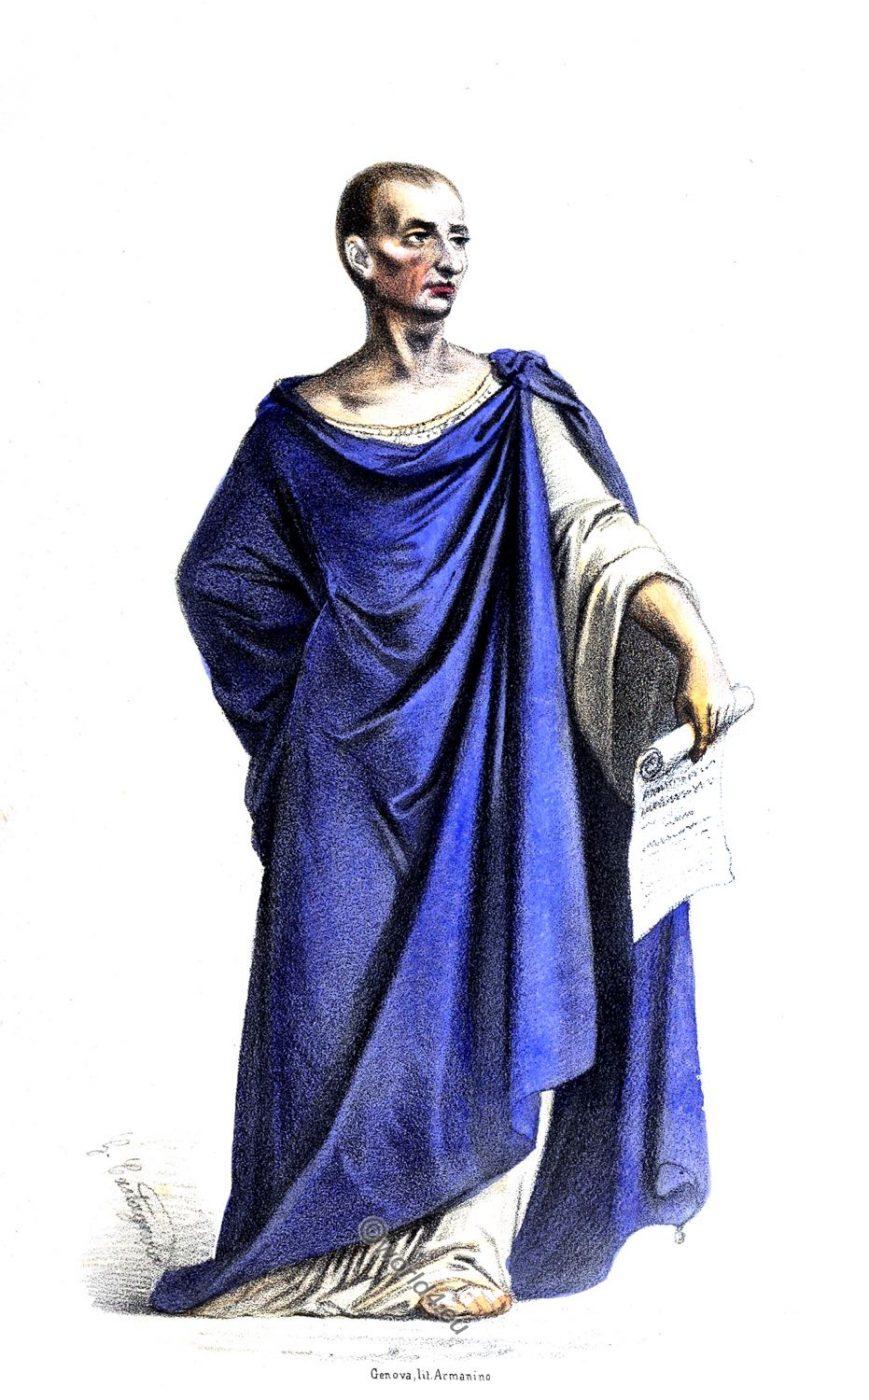 Marcus Tullius Cicero, Cicerone, Rome, Roman, ancient, politician, lawyer, writer, philosopher